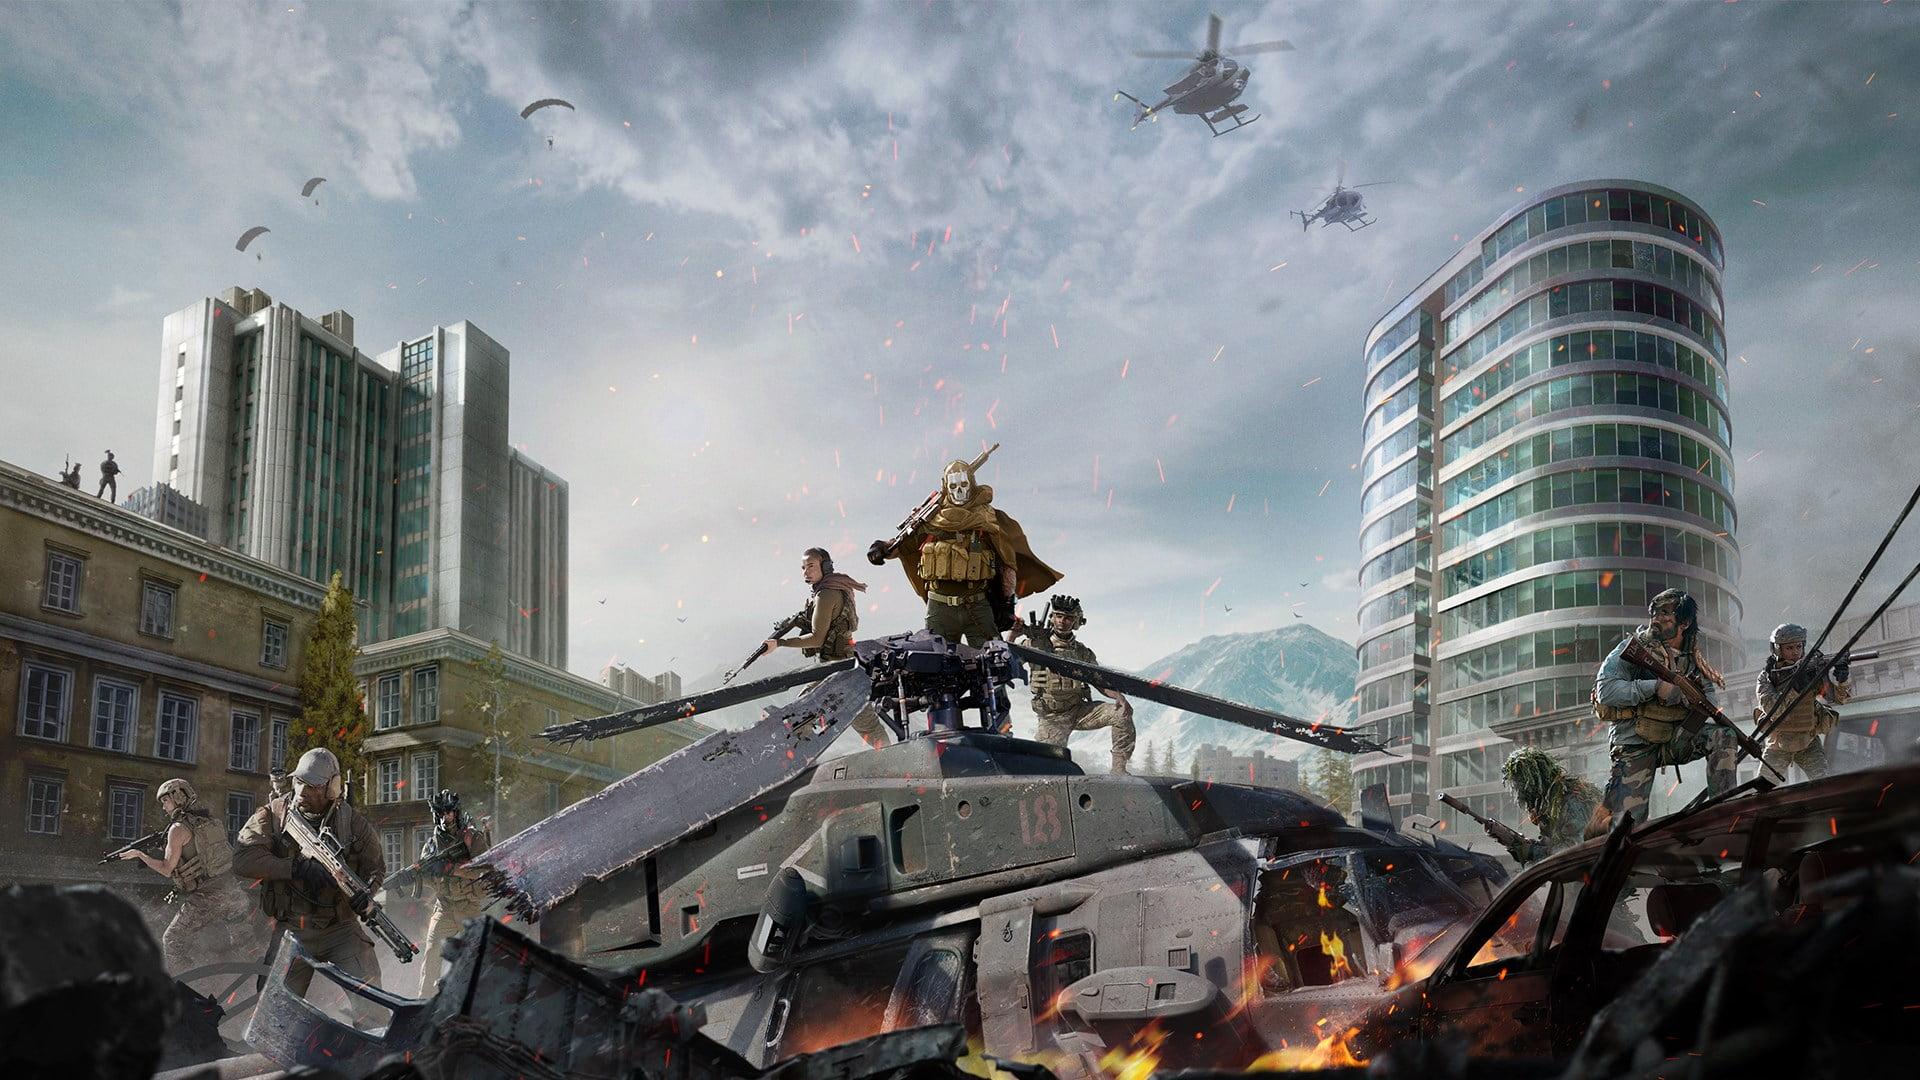 Call Of Duty 2020: Annuncio Imminente? 13 - Hynerd.it